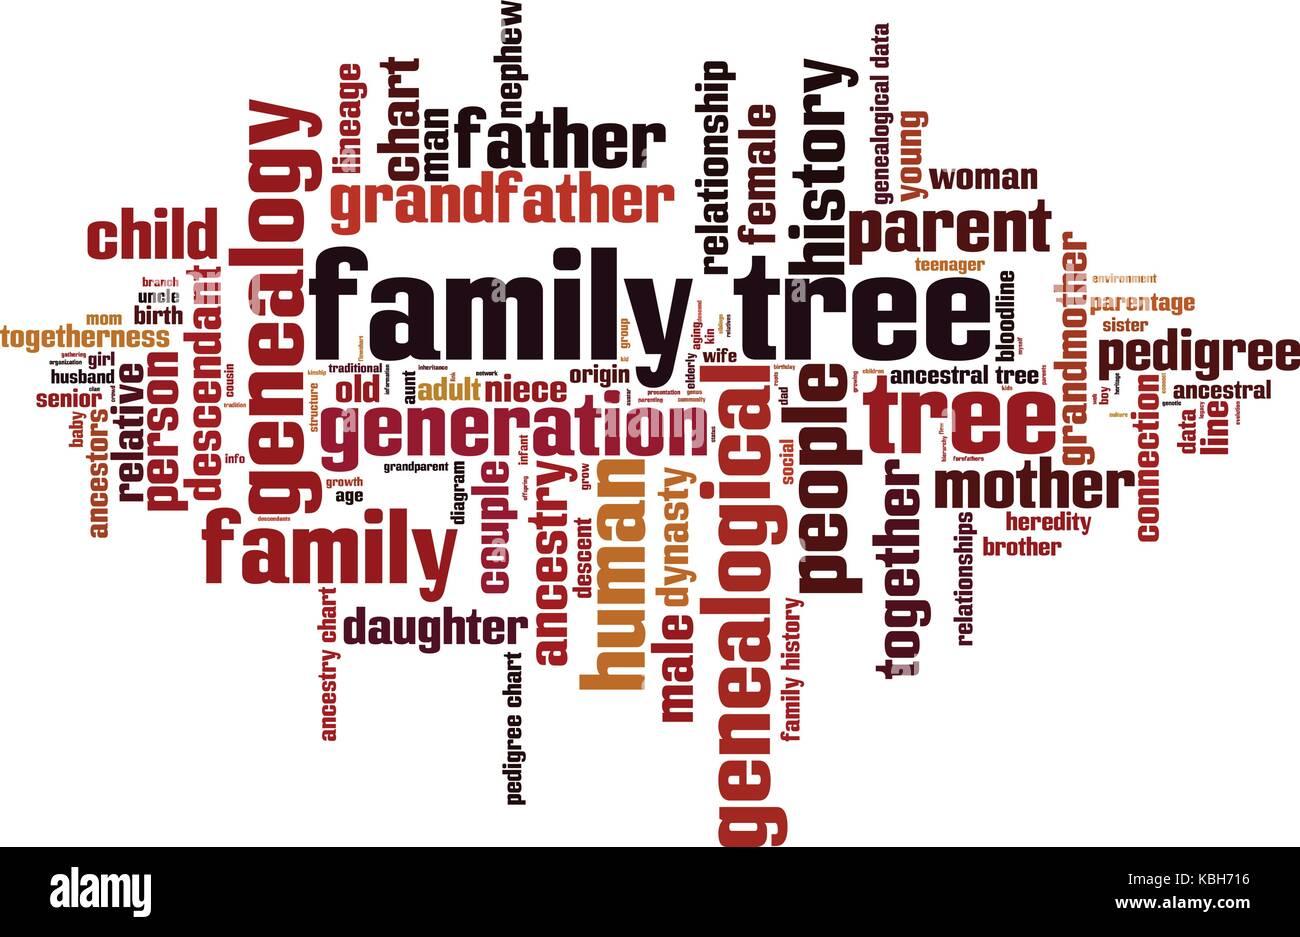 family tree genealogy illustration stock photos  u0026 family tree genealogy illustration stock